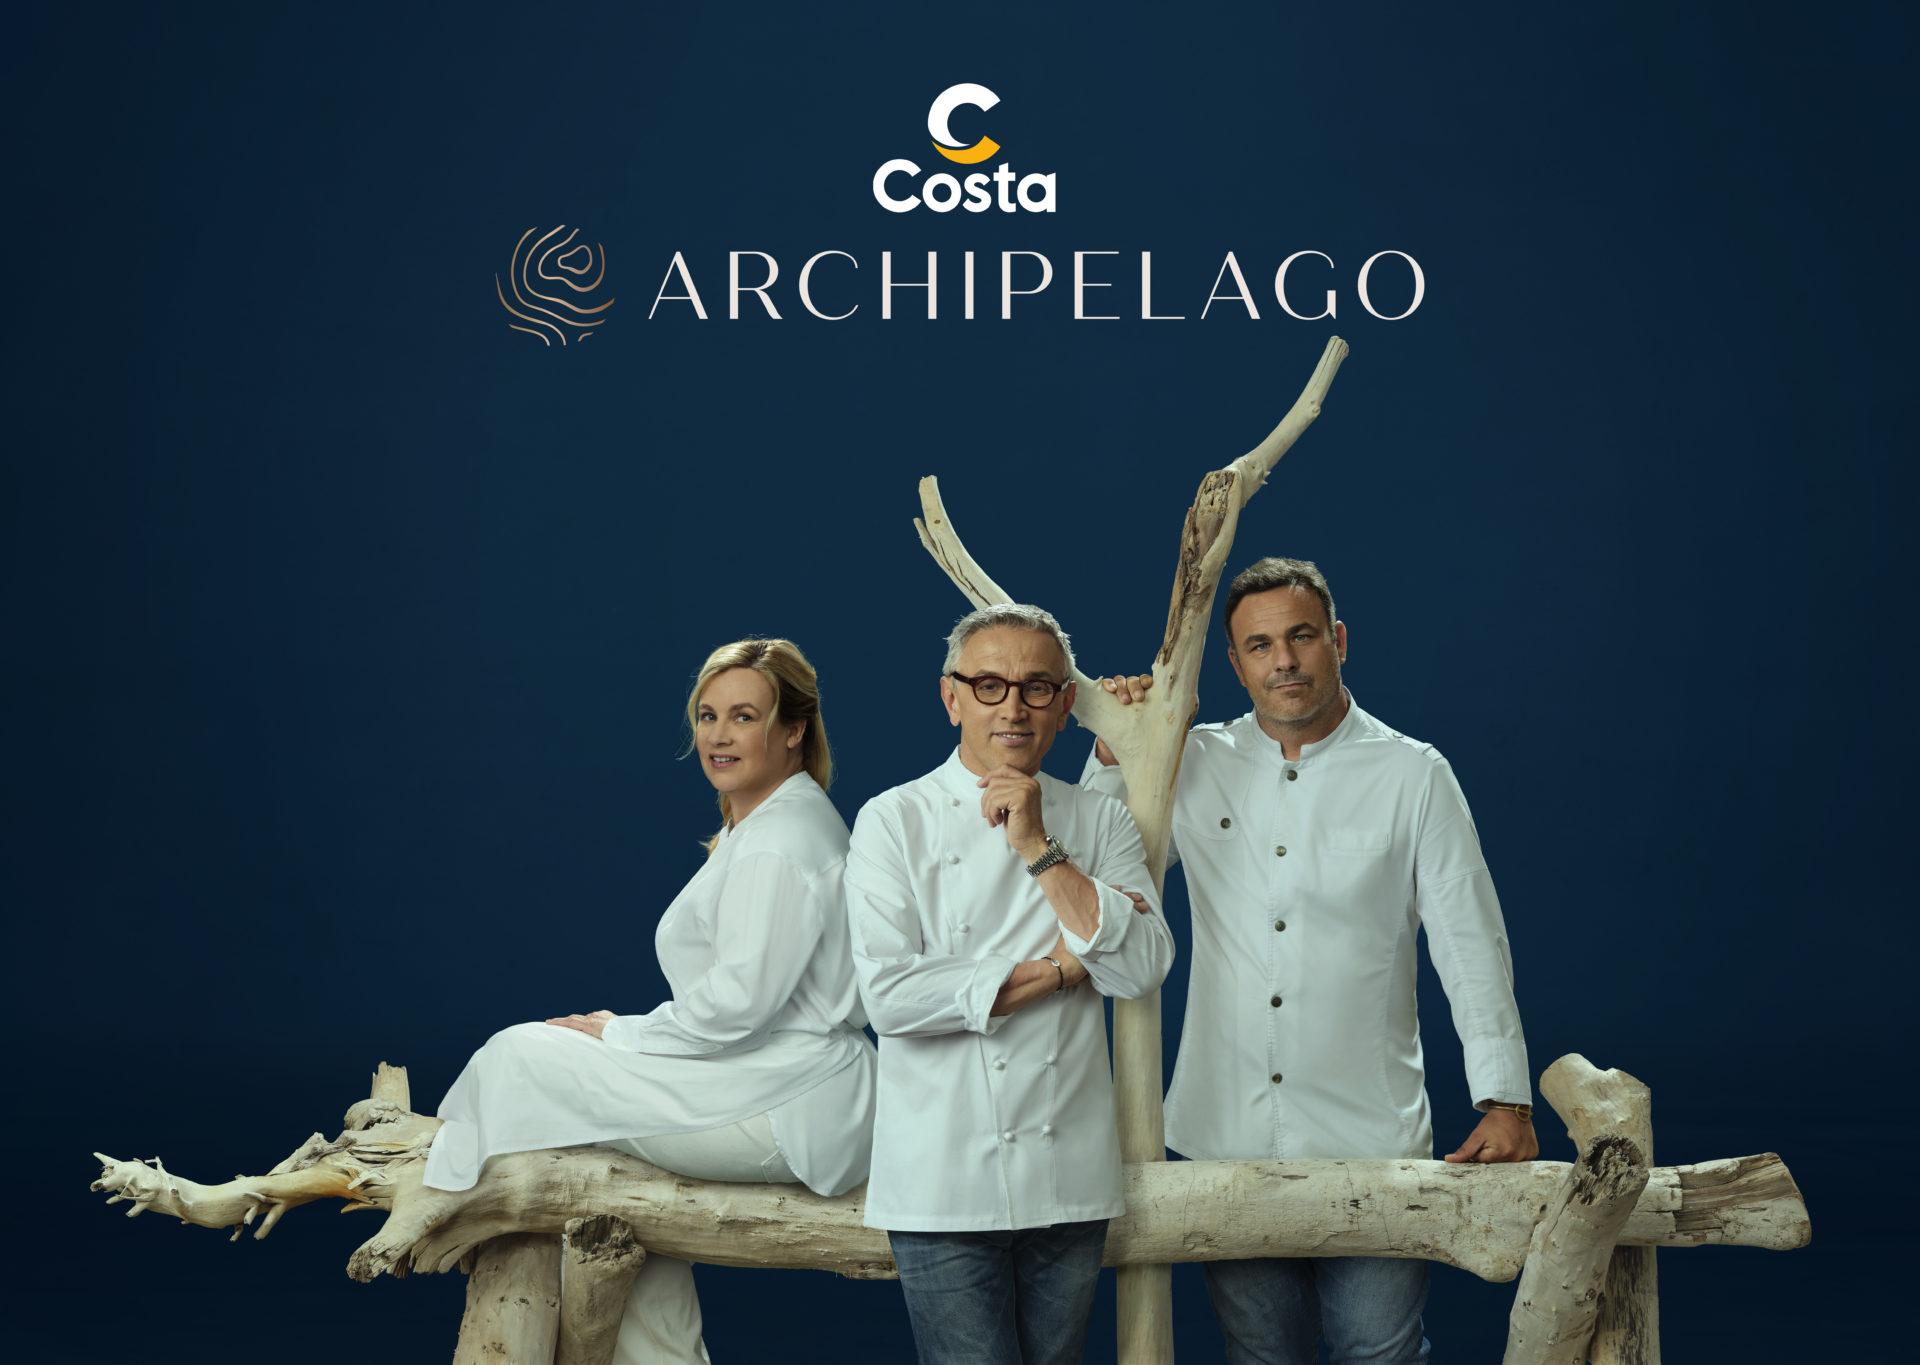 Restaurante Archipielago Costa Cruceros